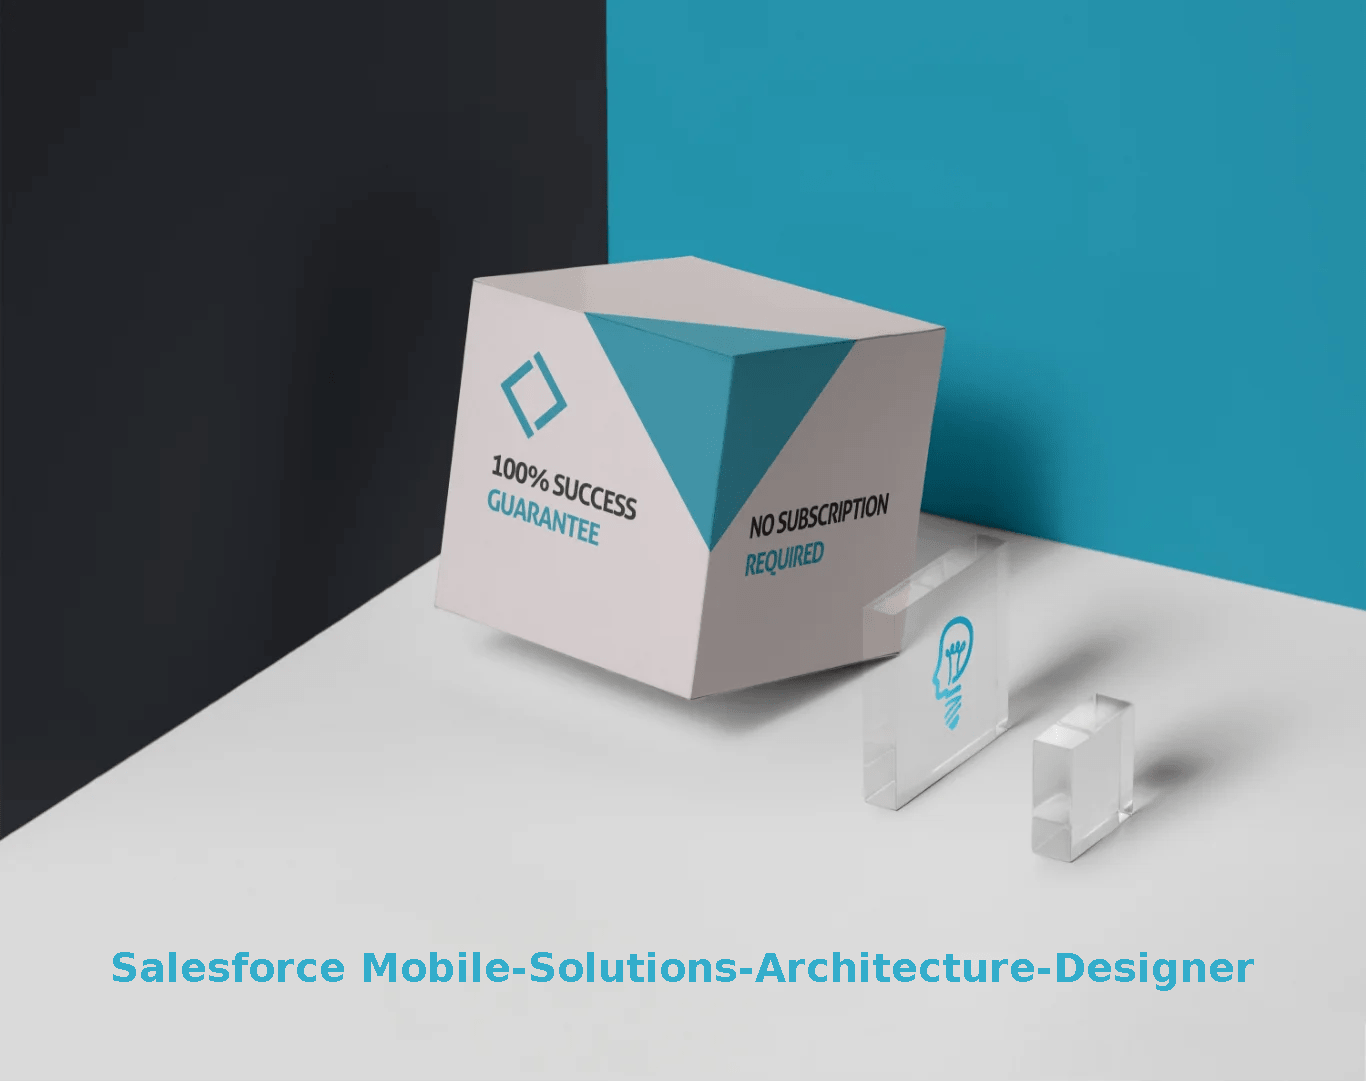 Salesforce Mobile-Solutions-Architecture-Designer Exams